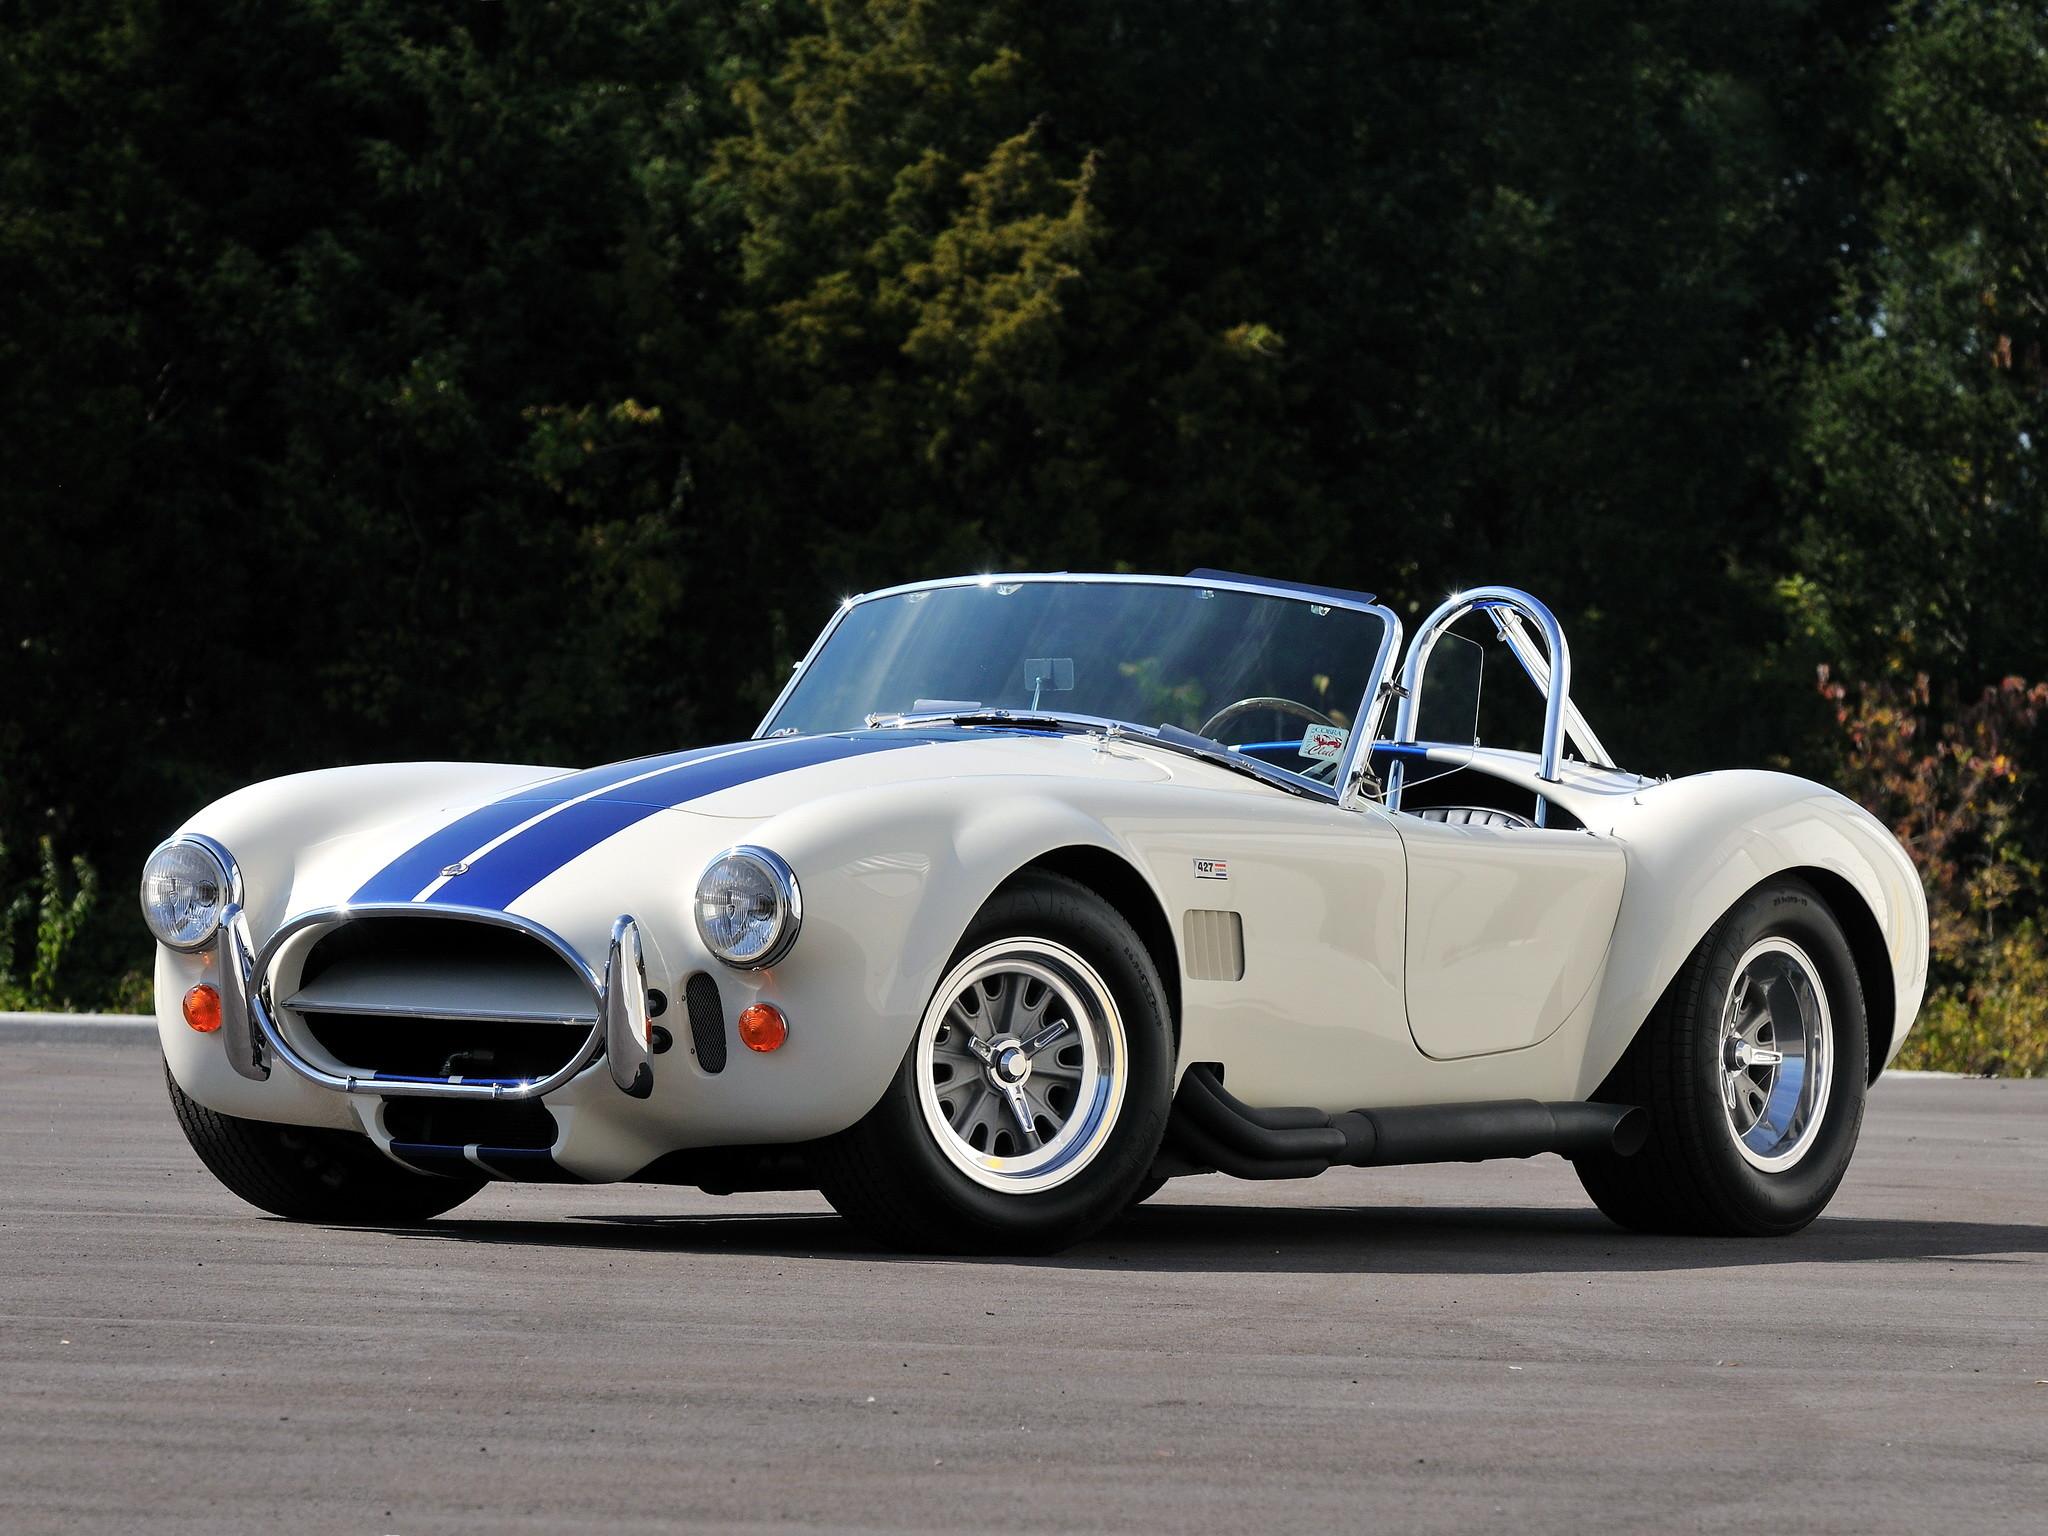 Ac Shelby Cobra Wallpaper